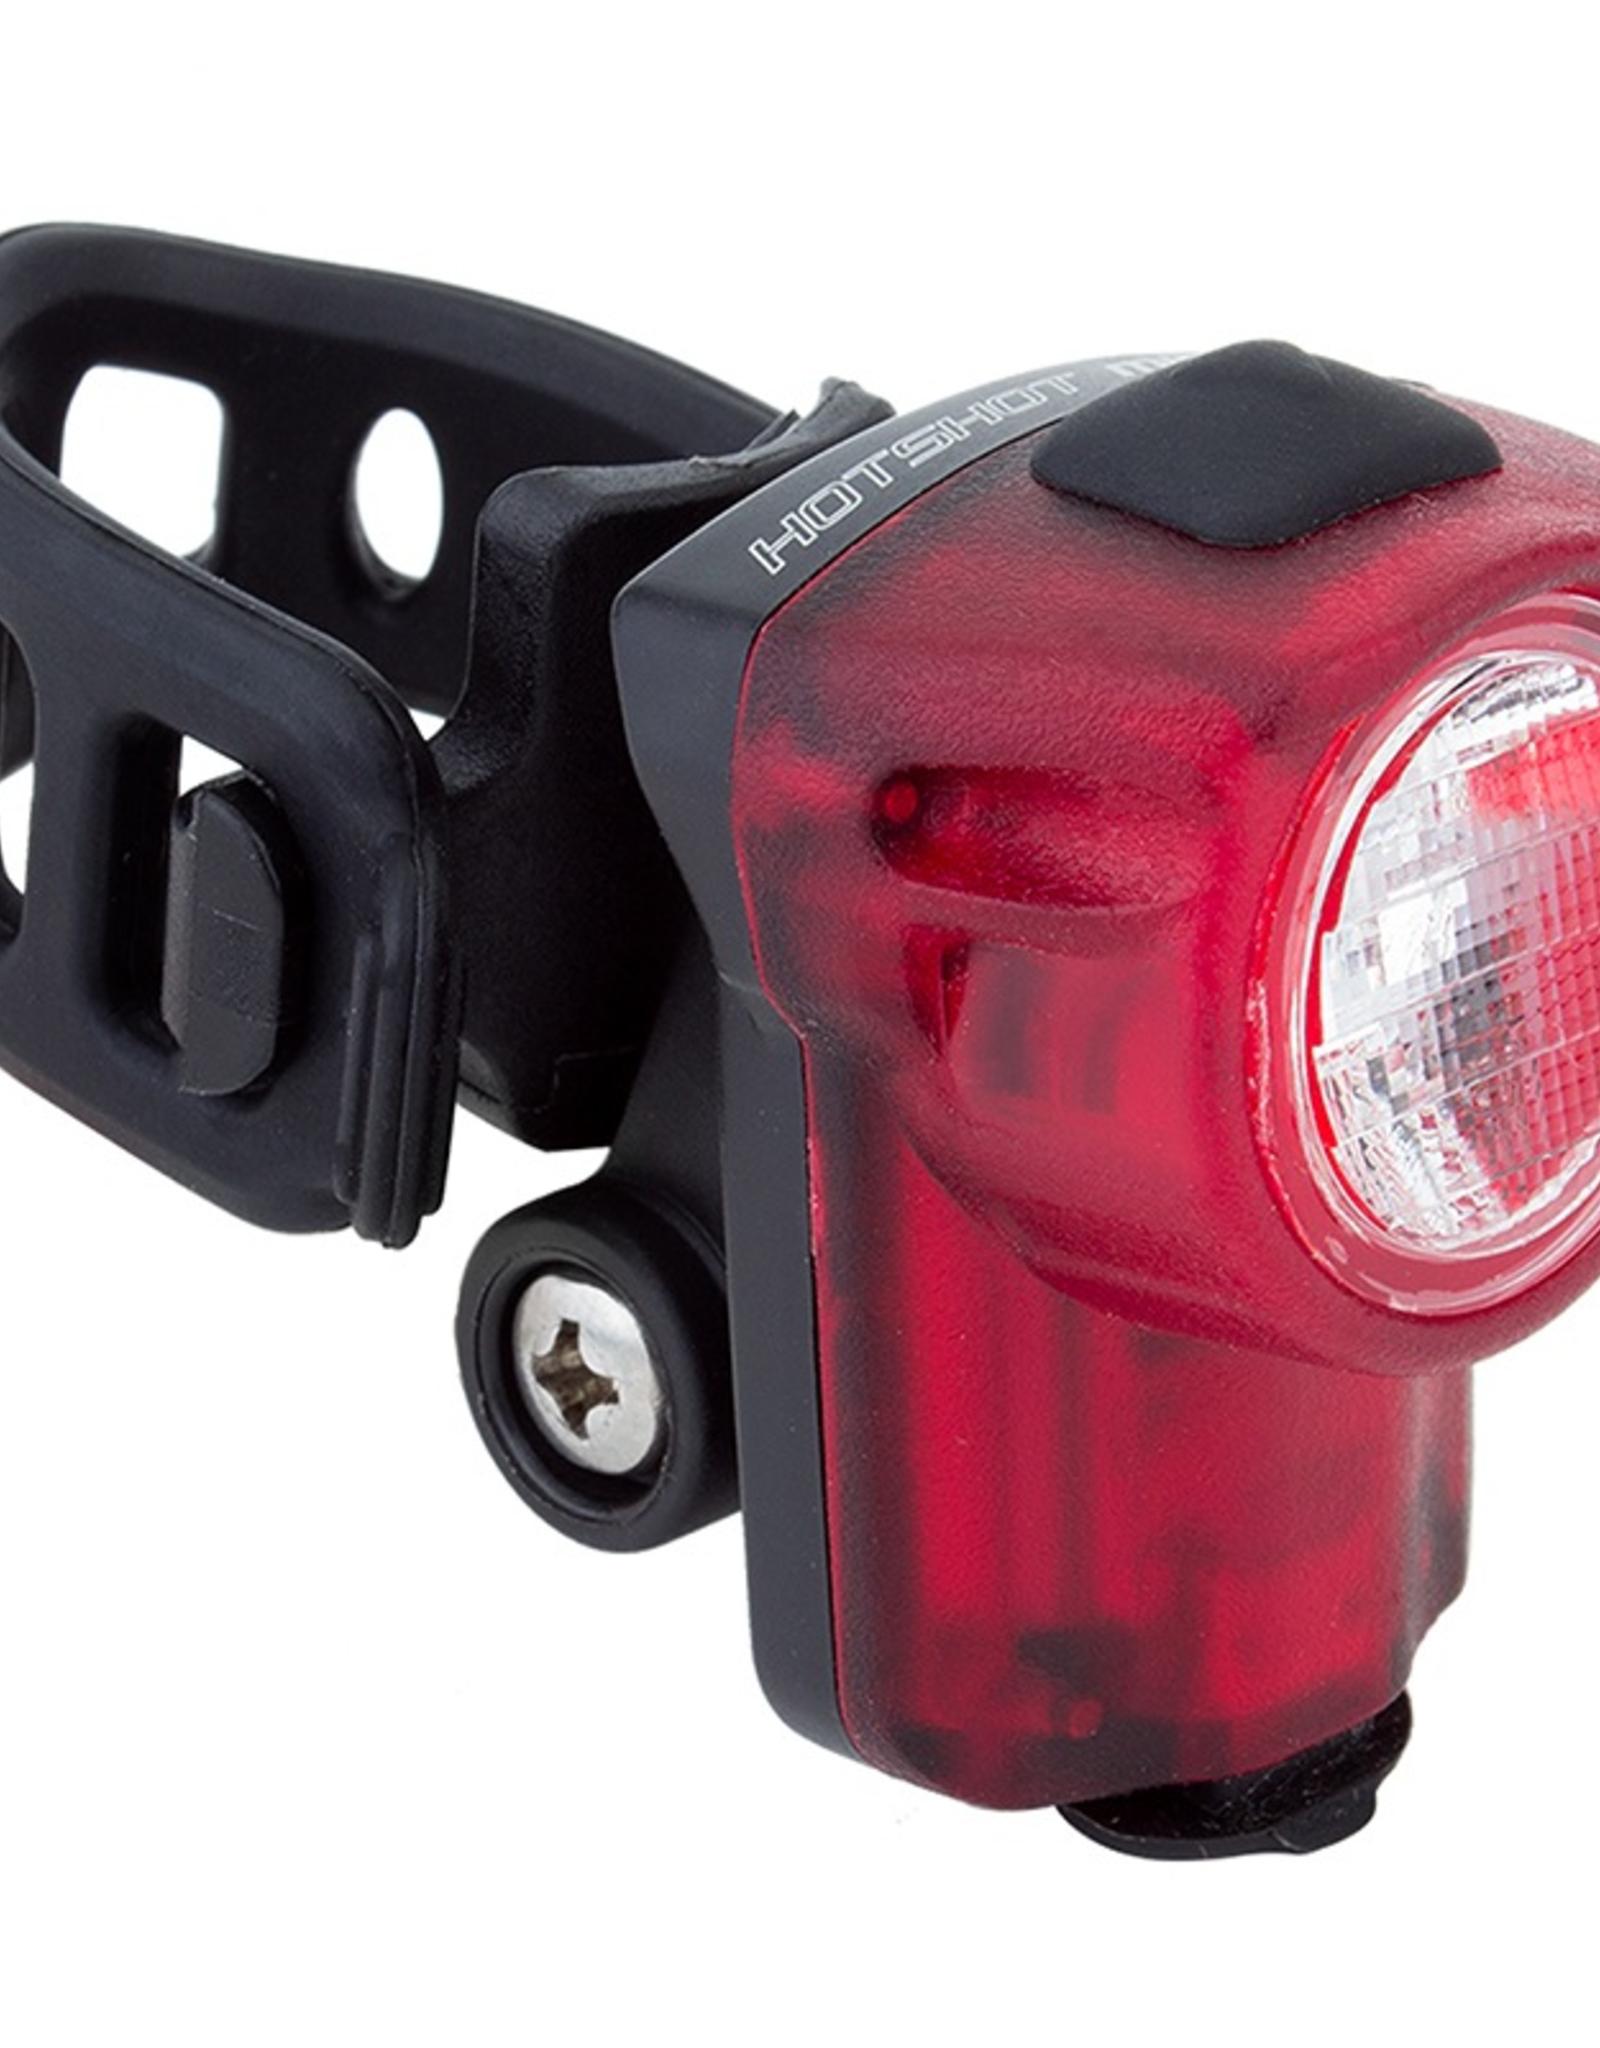 Cygolite Cygolite Hotshot Micro USB Rechargeable LED Tail Light